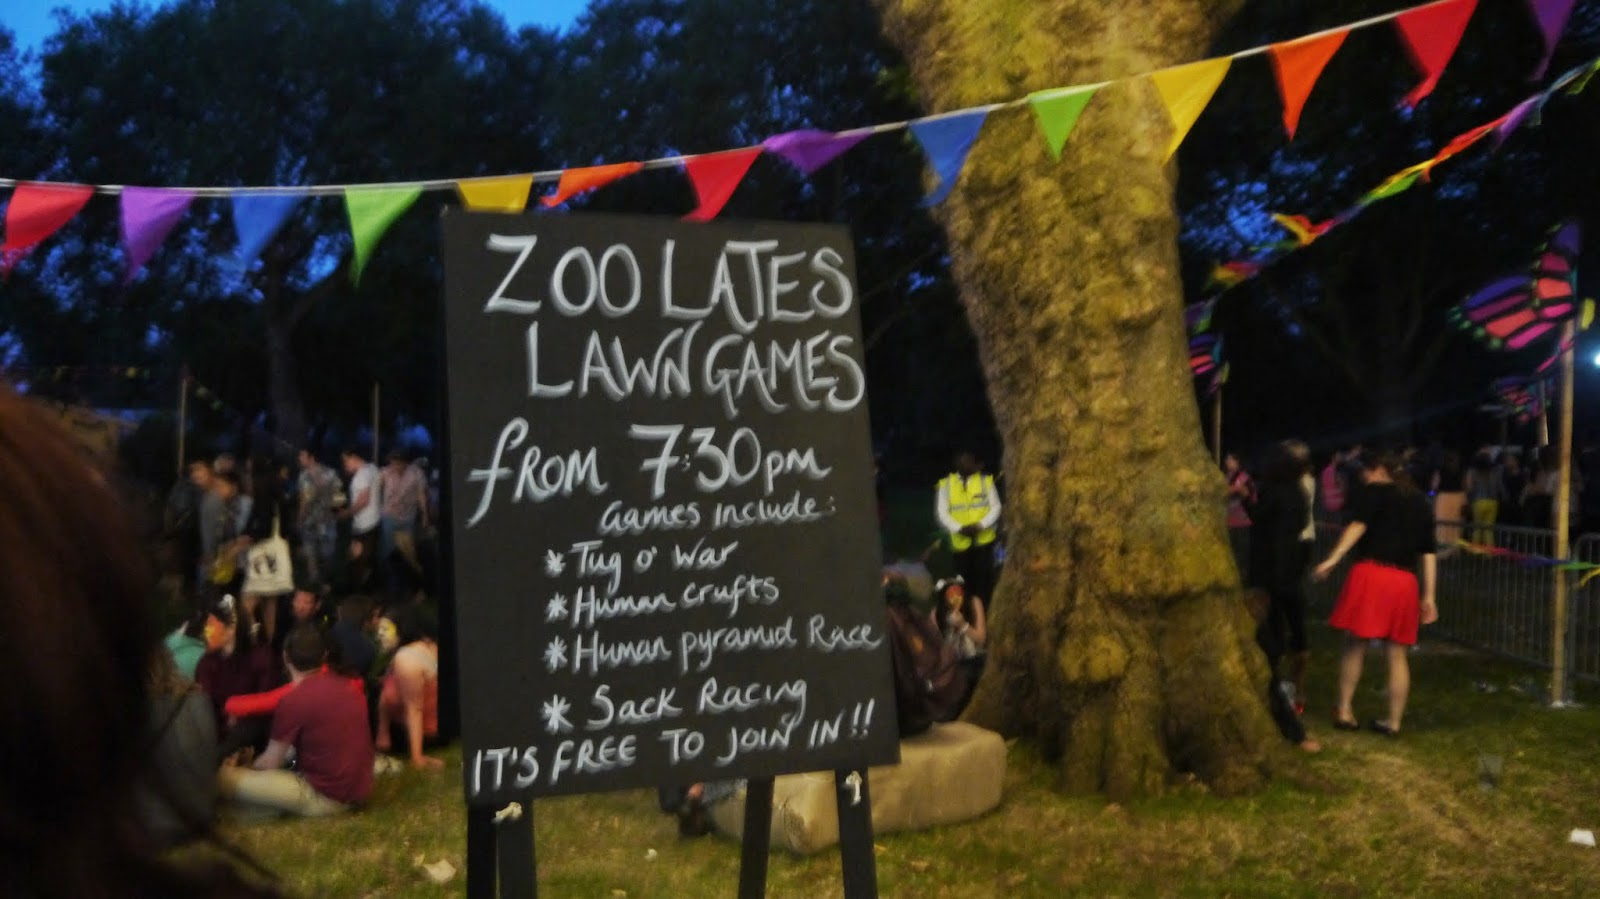 London Zoo lates